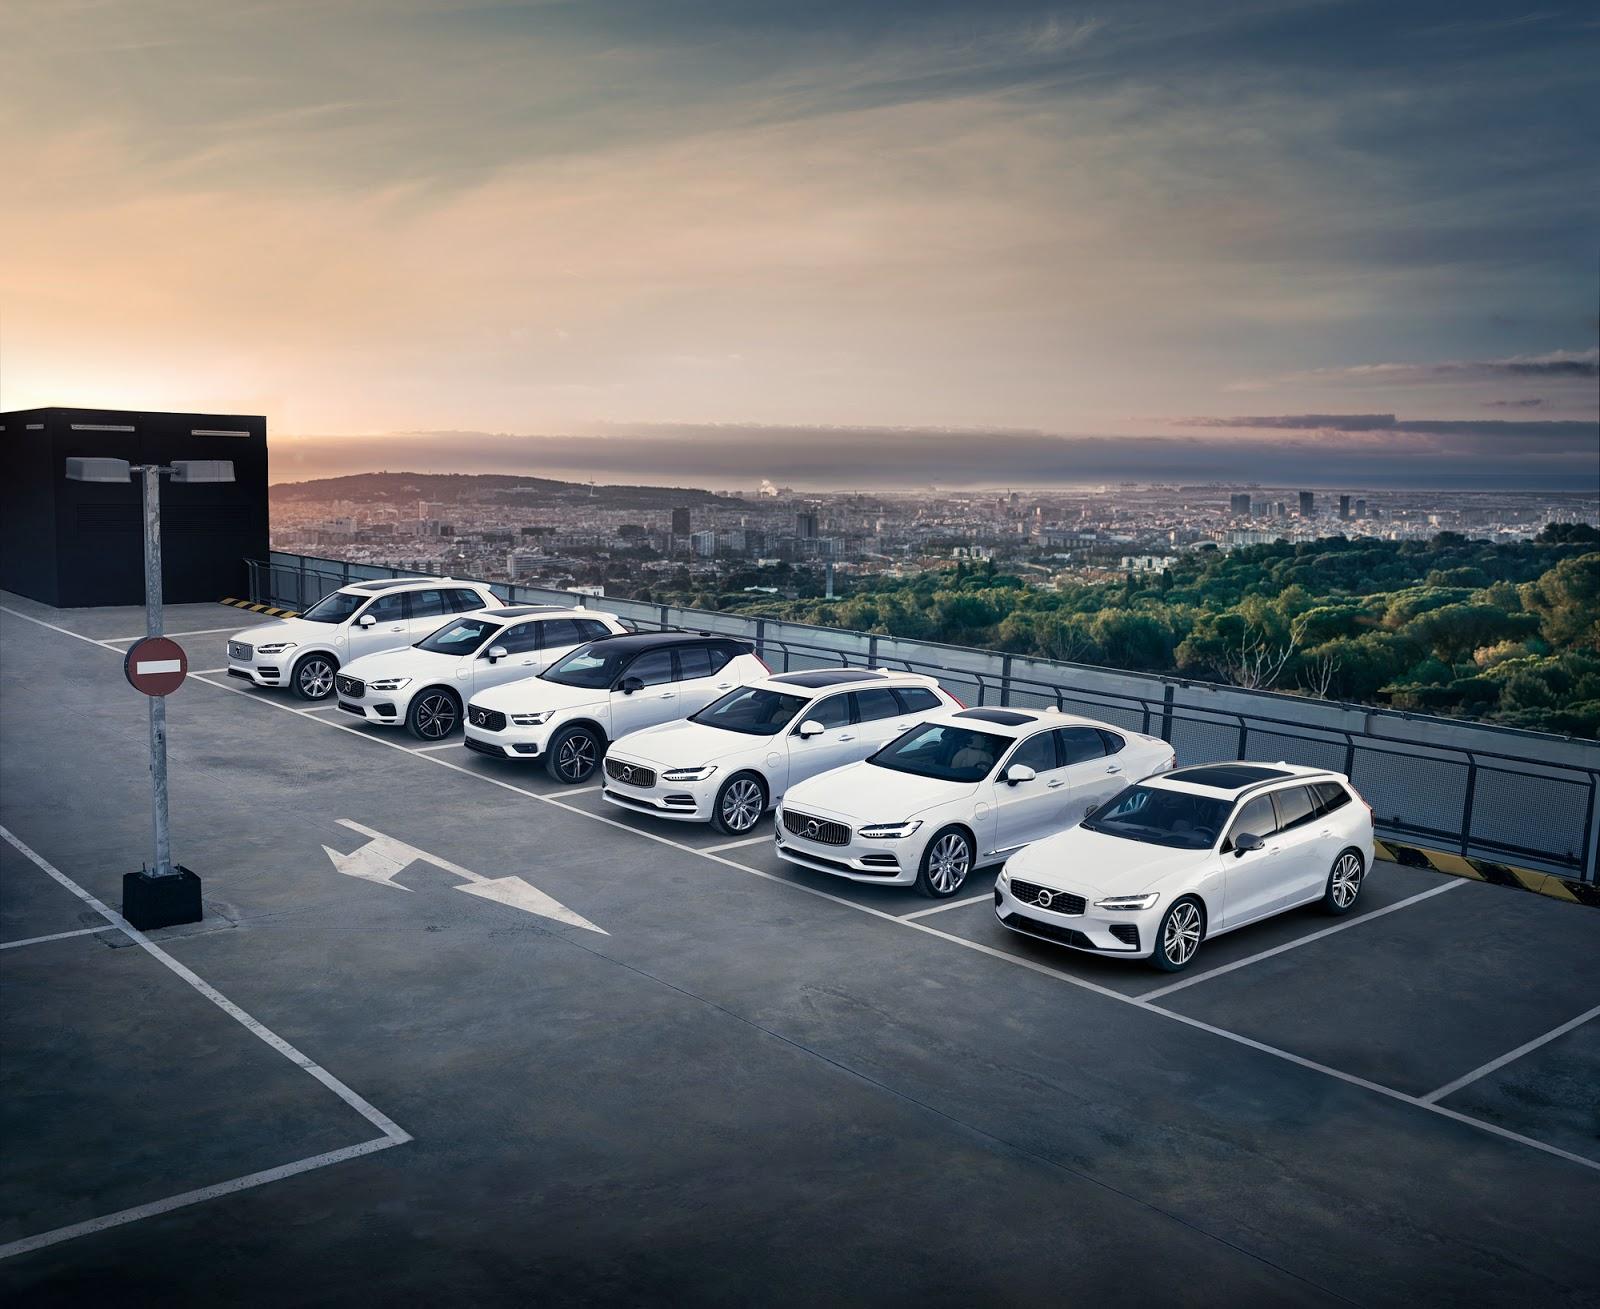 Hybrid2BRange H Volvo επιδοτεί όλα τα υβριδικά της μοντέλα! Electric cars, Volvo, zblog, προσφορές